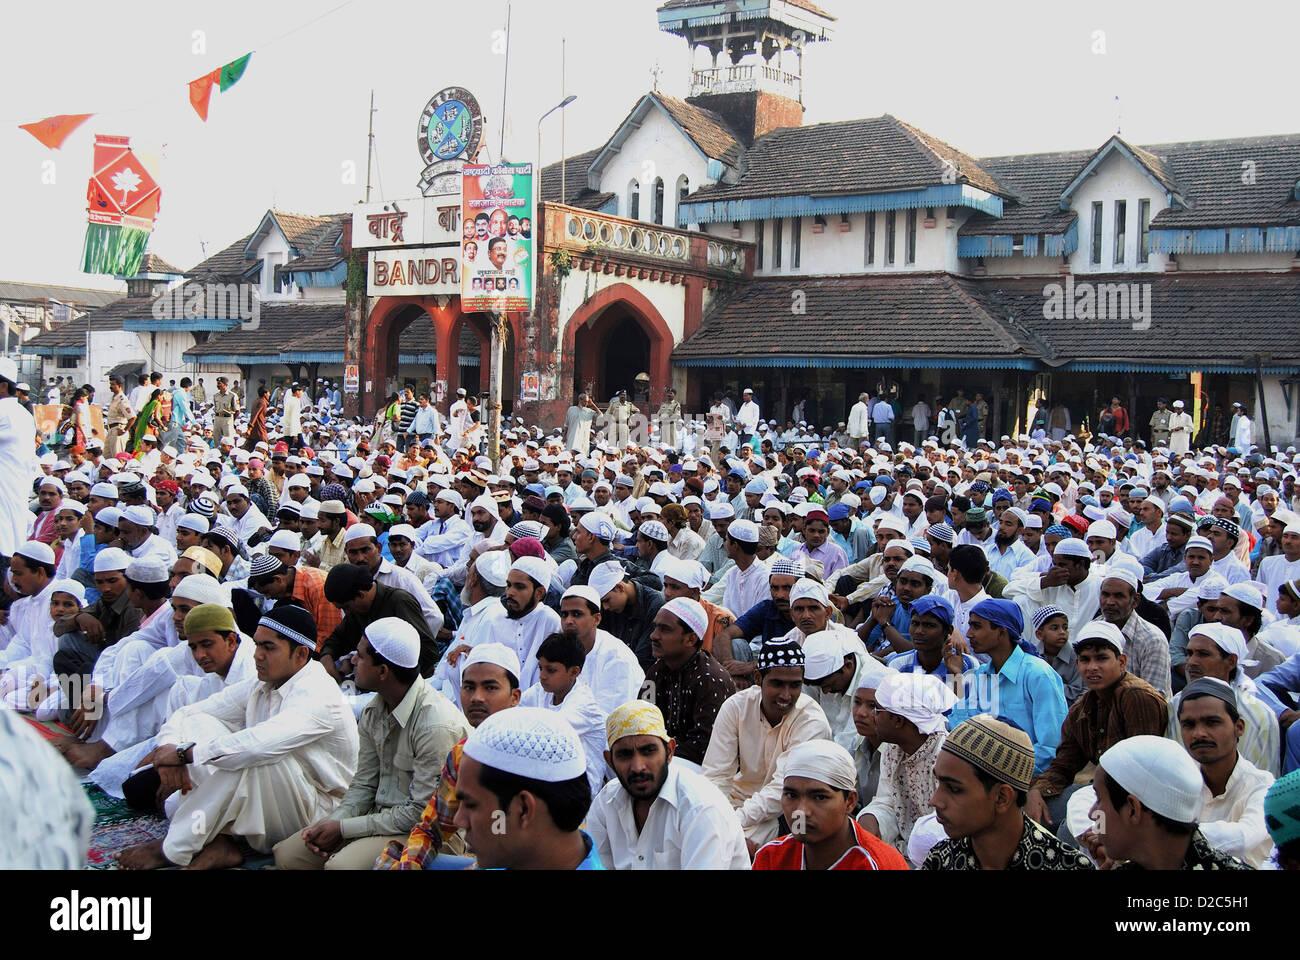 Muslims Sitting For Namaz On Id-Ul-Fitr Or Ramzan Id At Bandra Station, Bombay Mumbai, Maharashtra, India - Stock Image